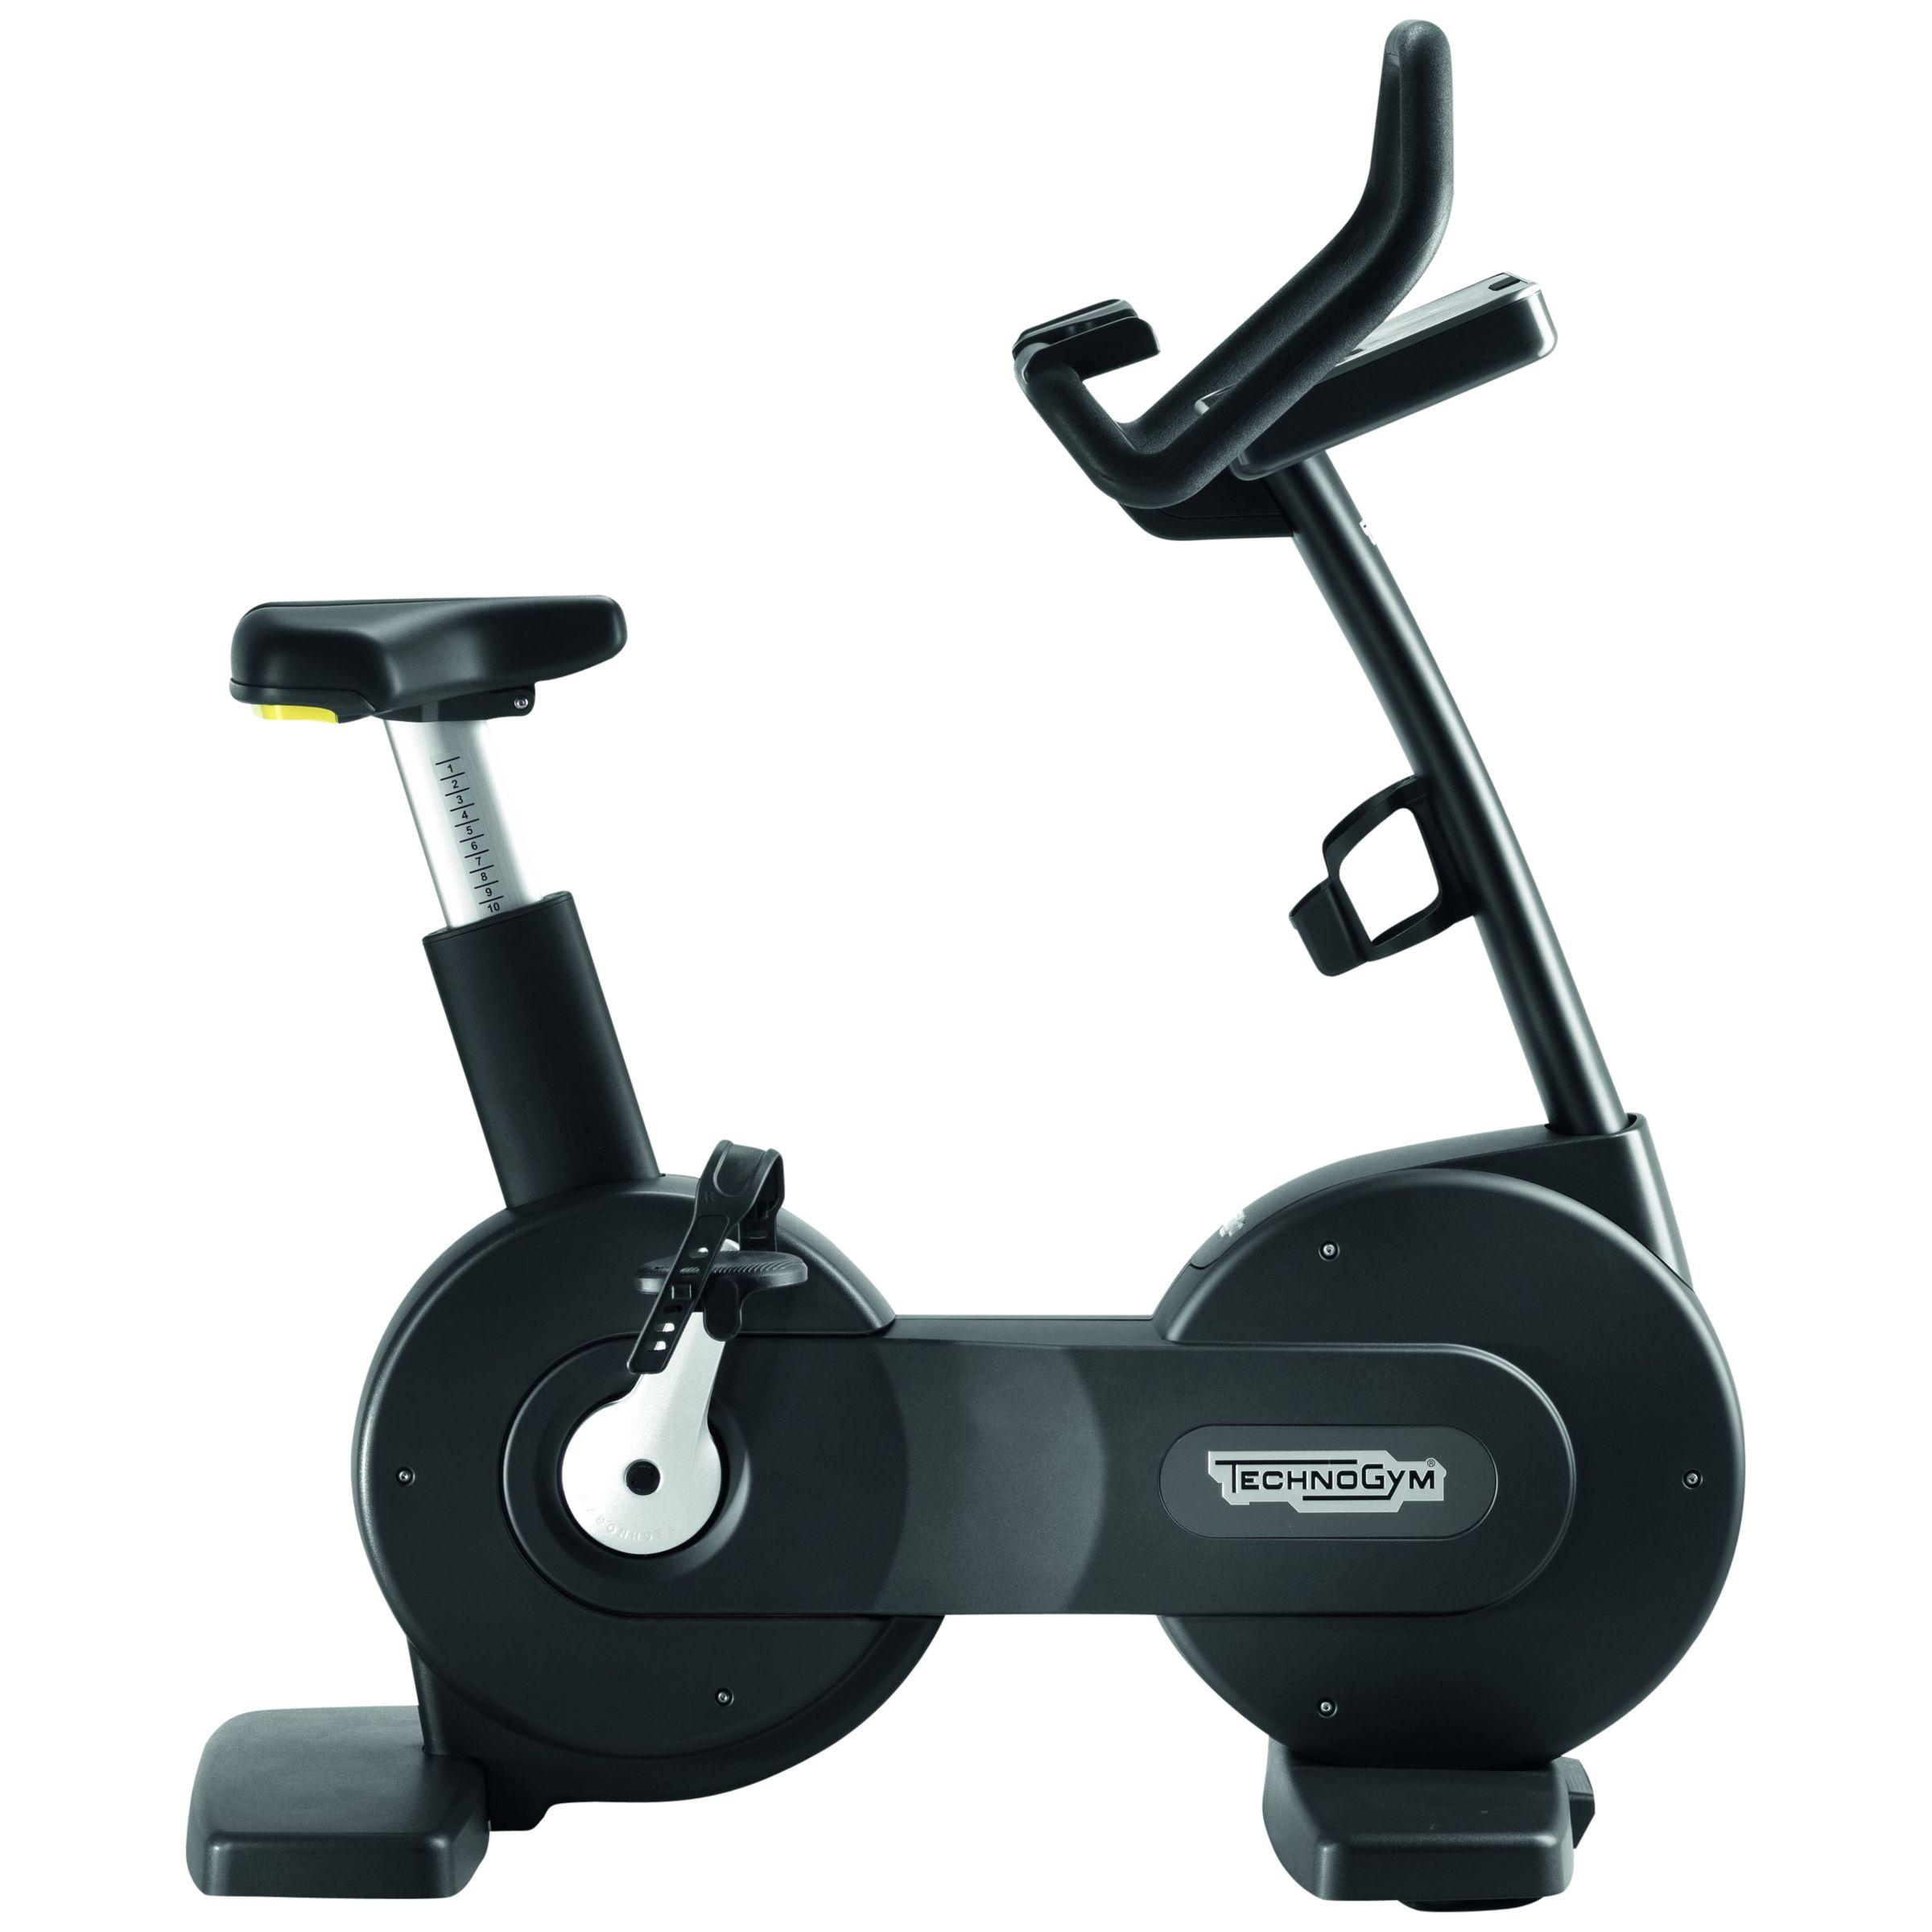 Technogym Technogym Bike Forma Exercise Bike with Training Link